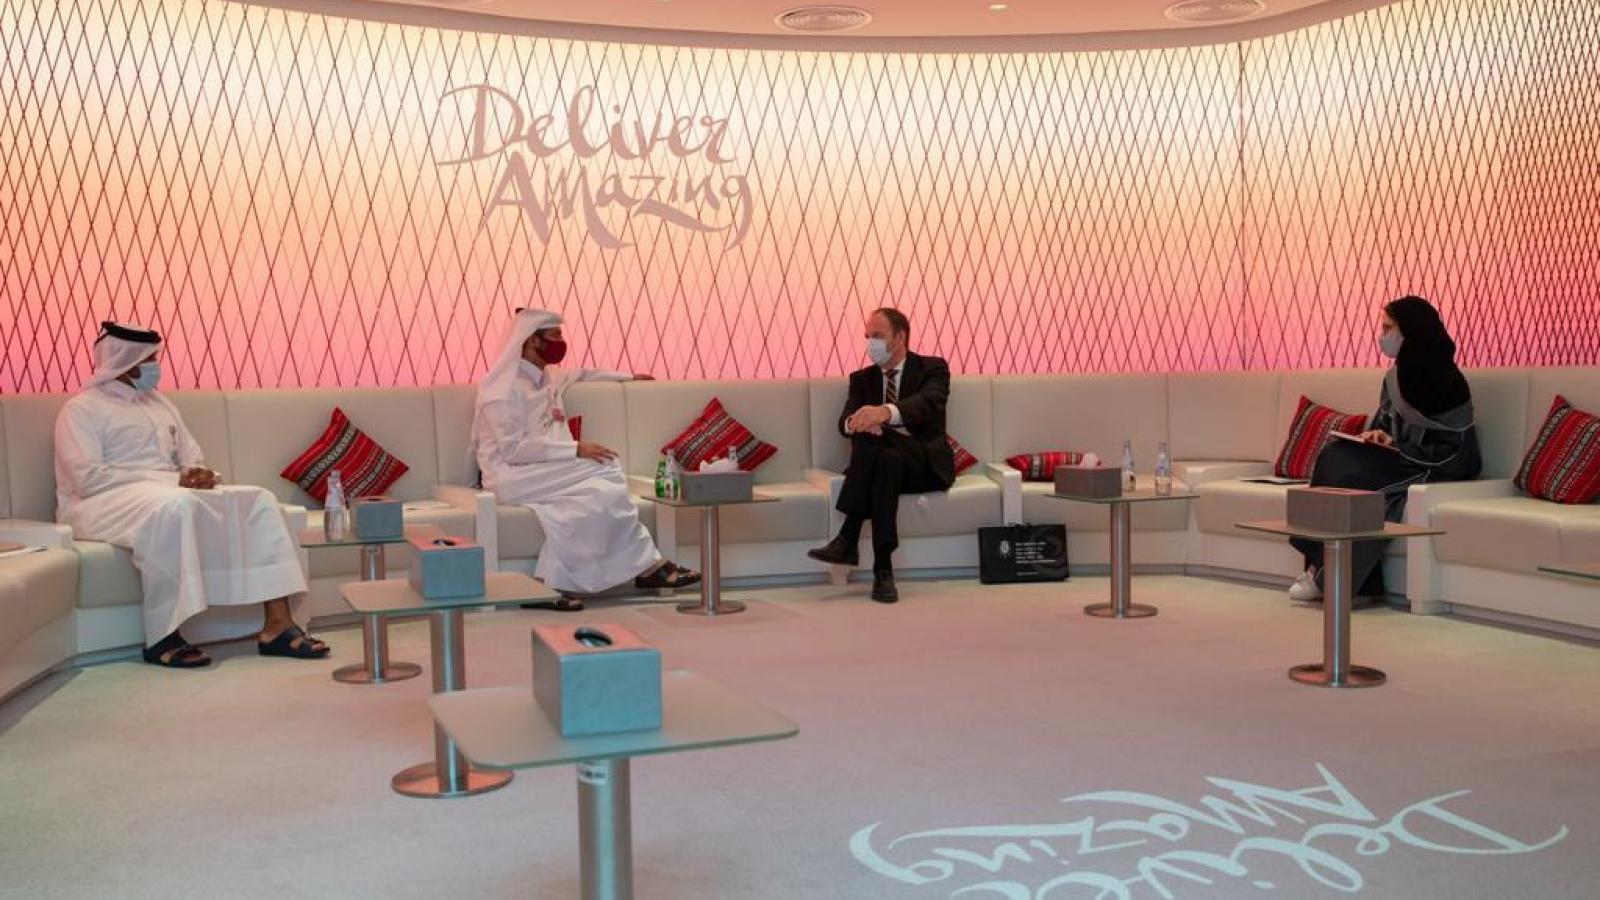 Belgian Ambassador praises Qatar's impressive FIFA World Cup 2022 preparations